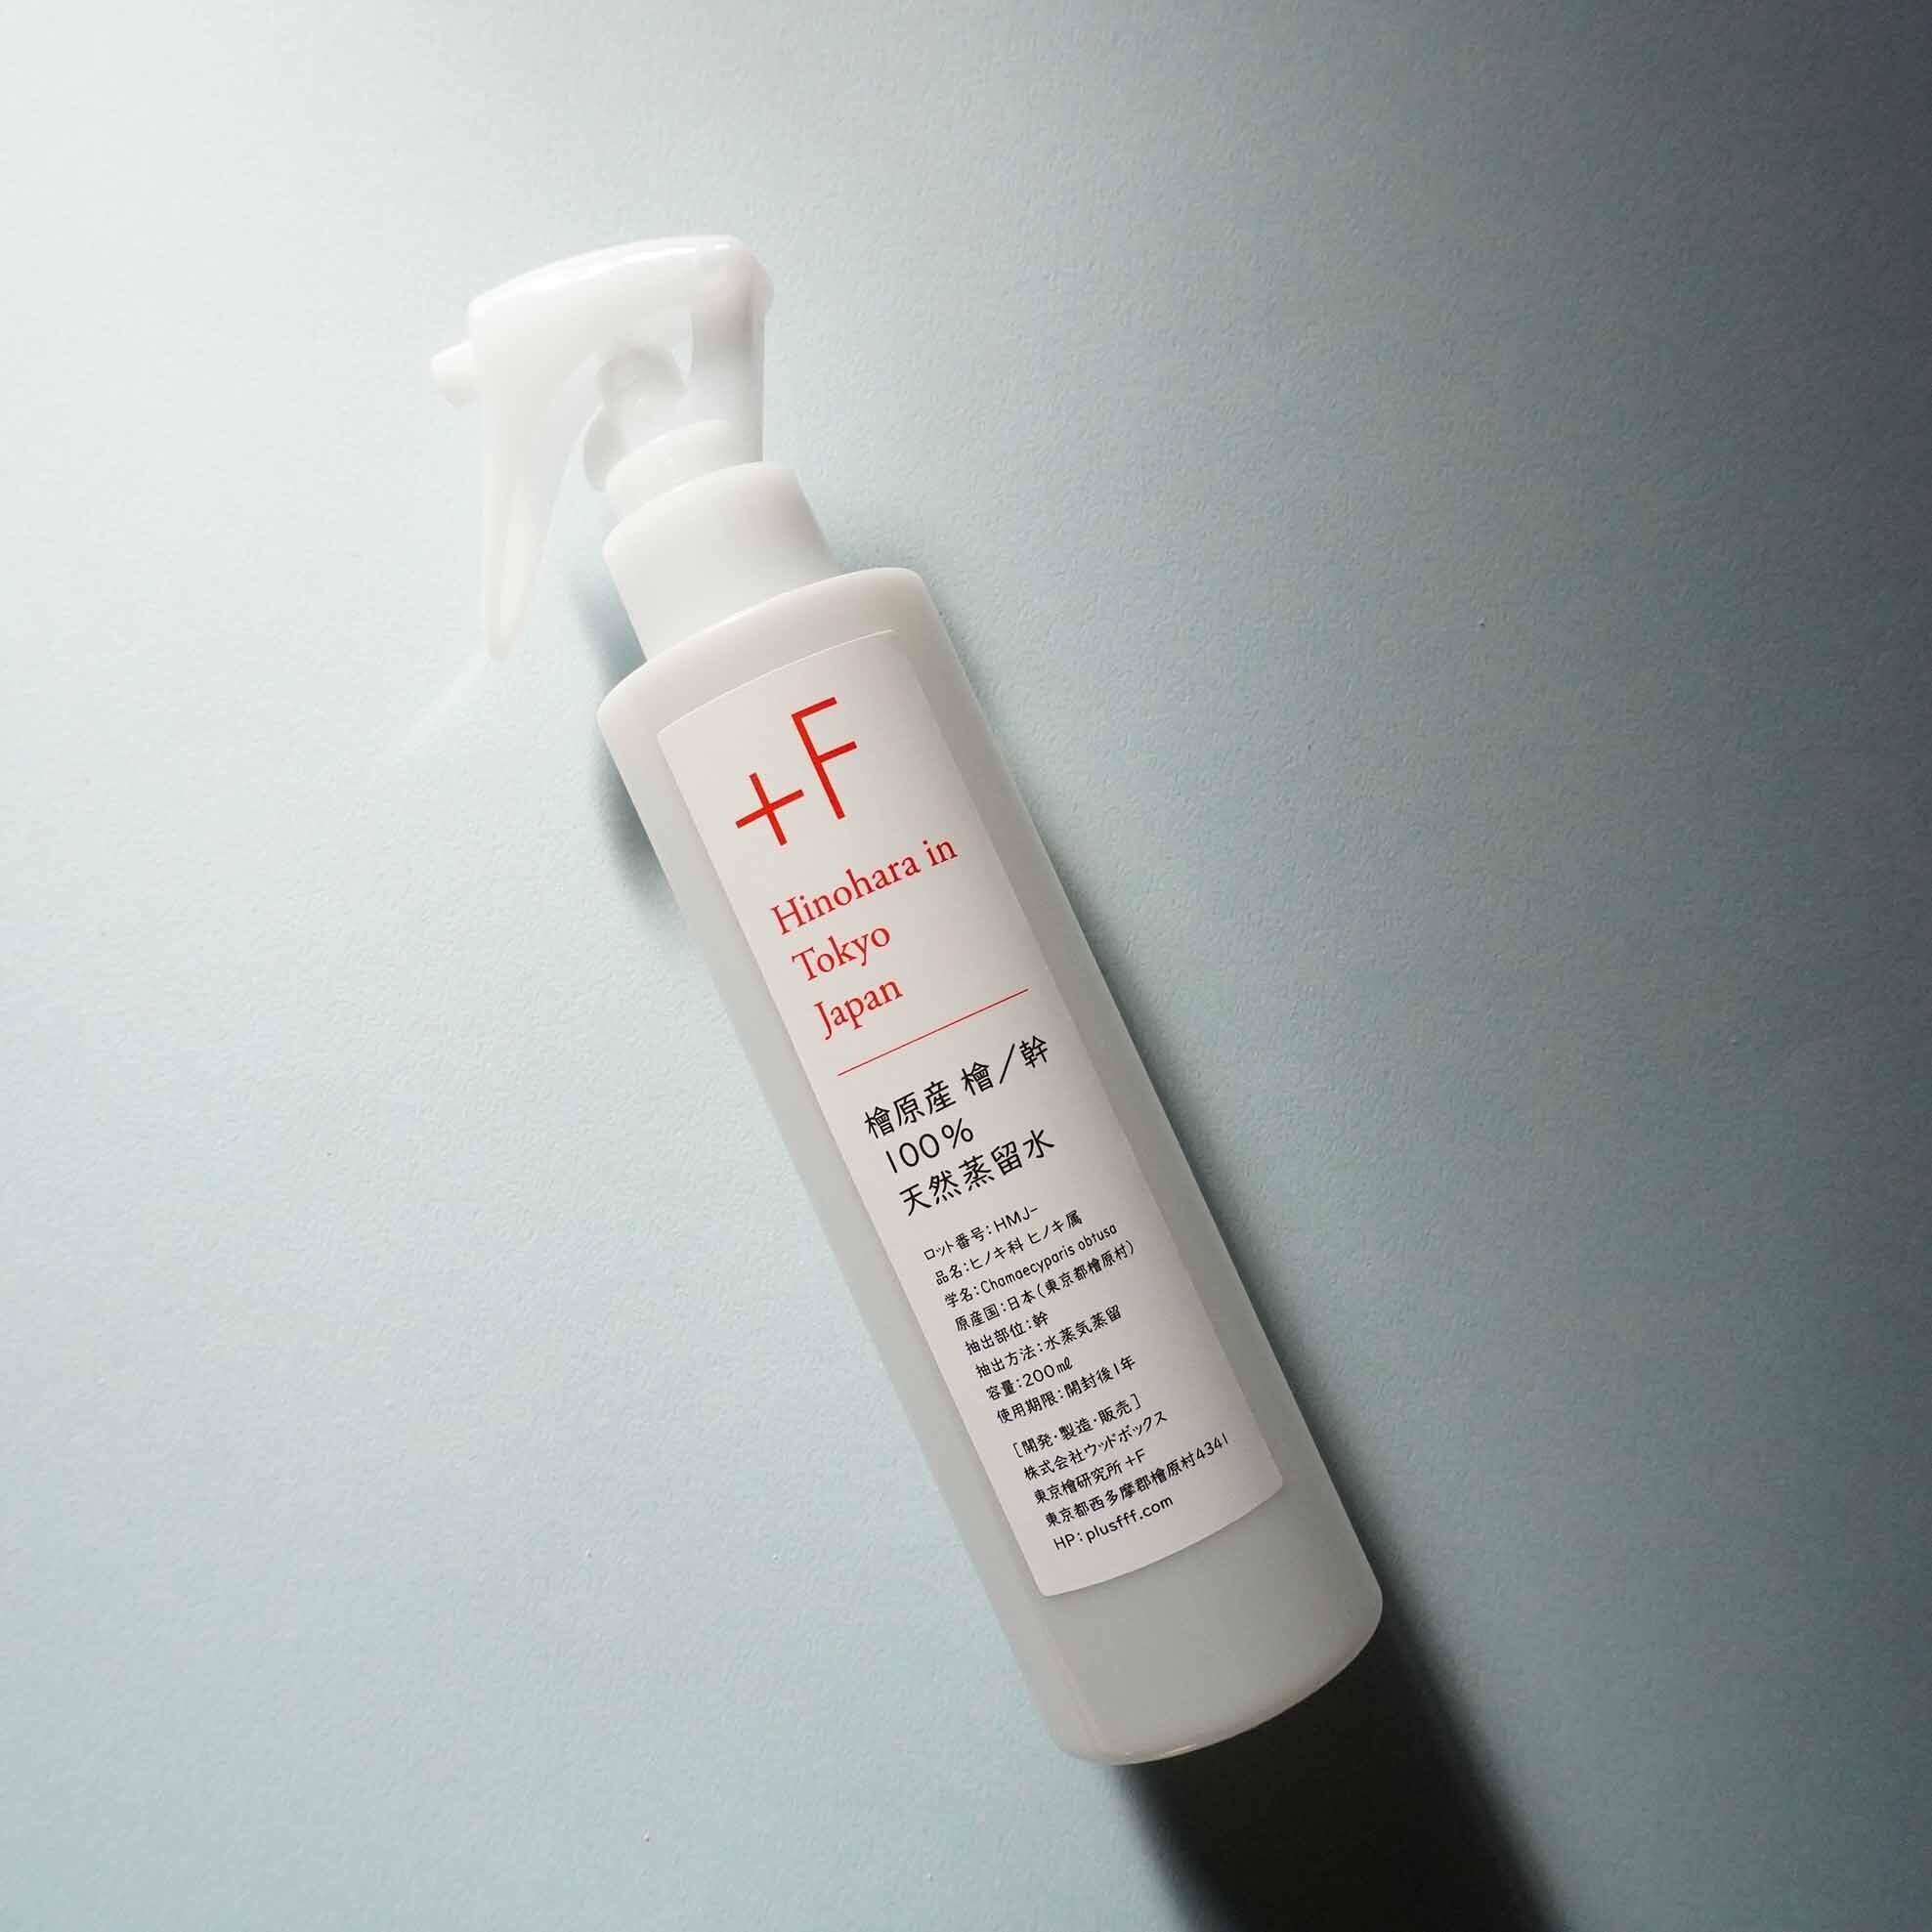 産直[+F]100%天然成分 消臭・消臭・防虫 檜原産ヒノキ 天然蒸留水 (200ml)